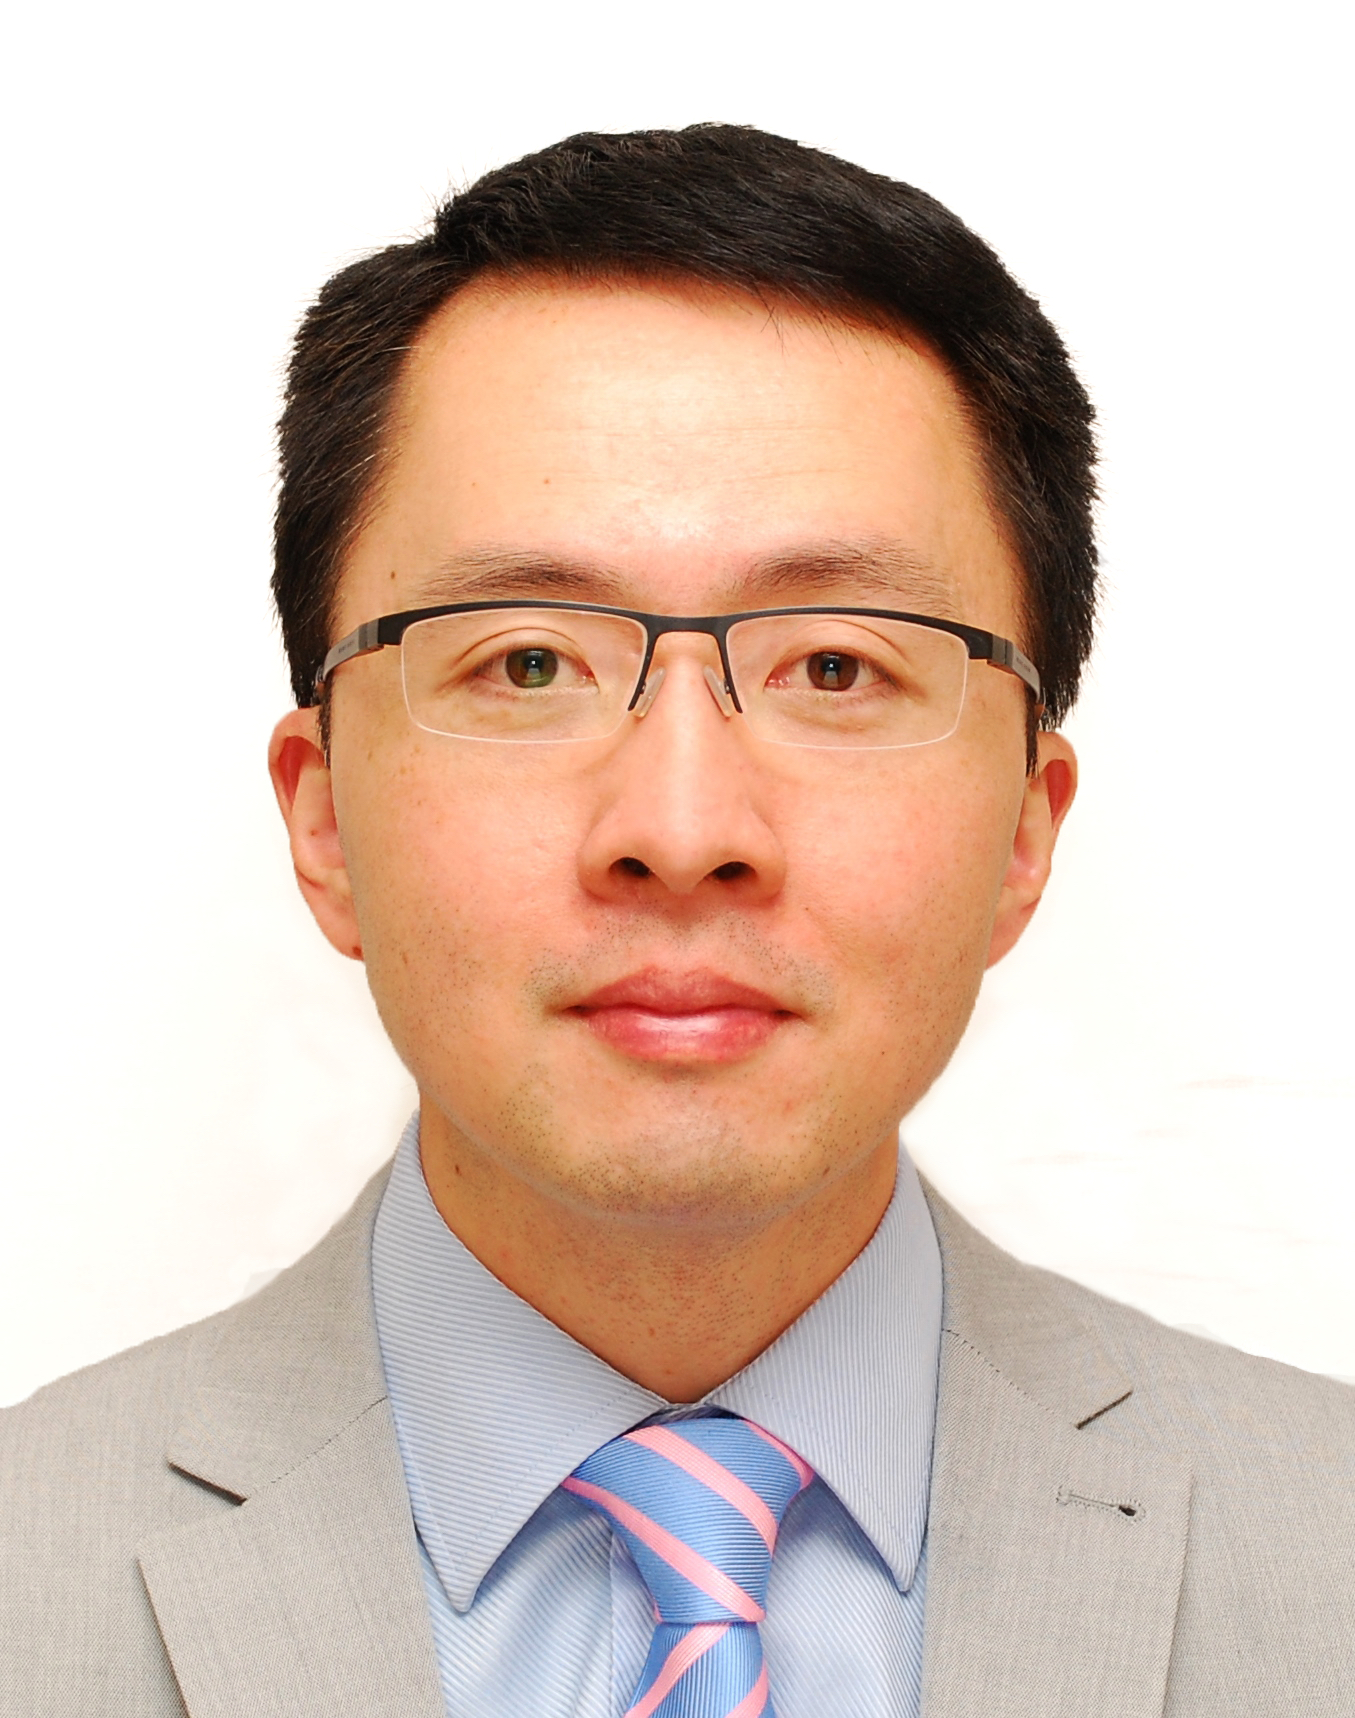 Patrick Yu-Wai-Man